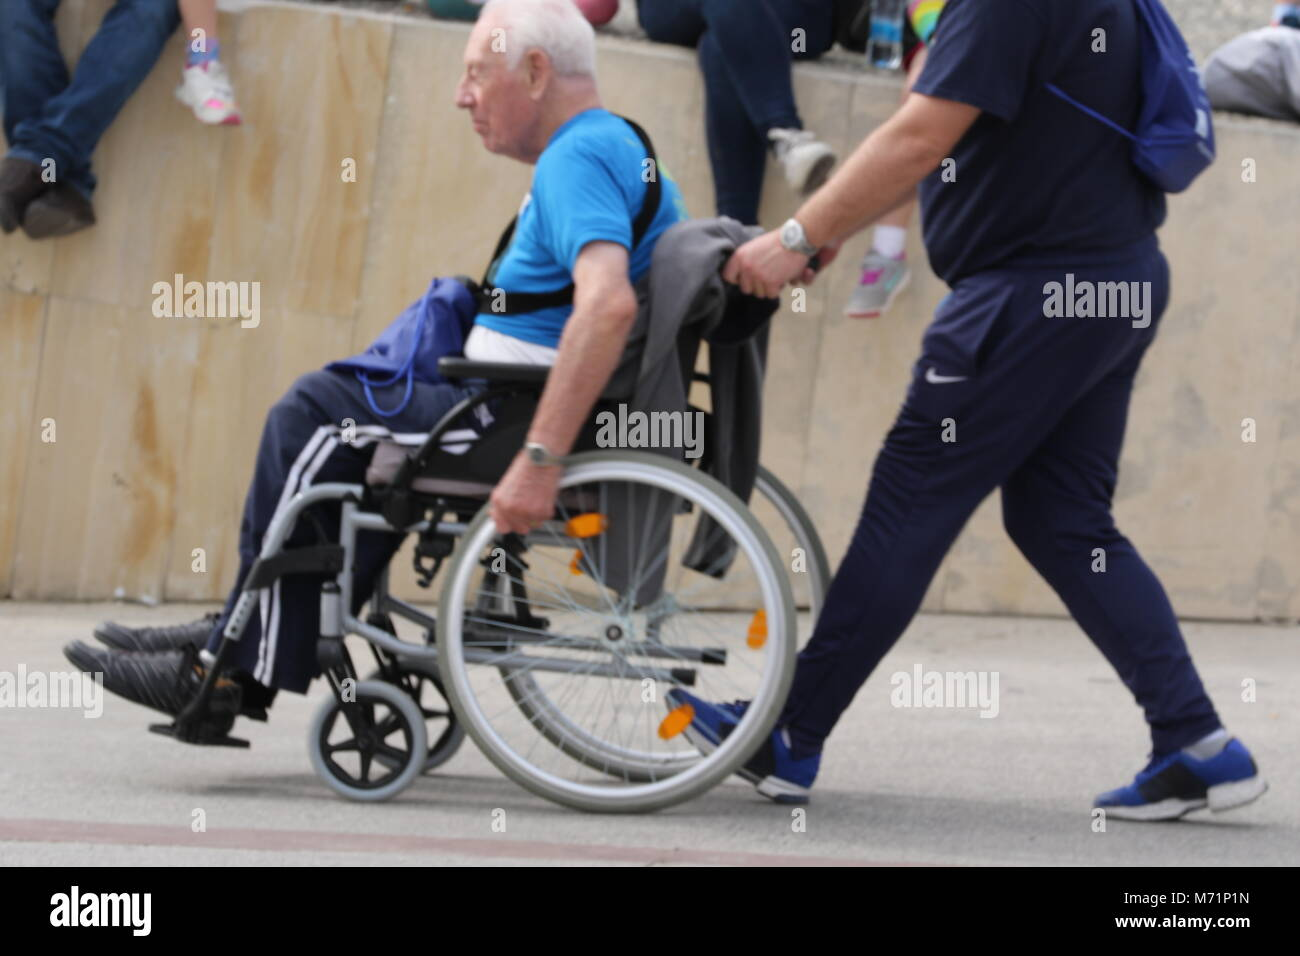 Wheelchair competitor at the 20th Logicom Cyprus marathon, half marathon, 10KM, 5KM fun run for international competitors - Stock Image